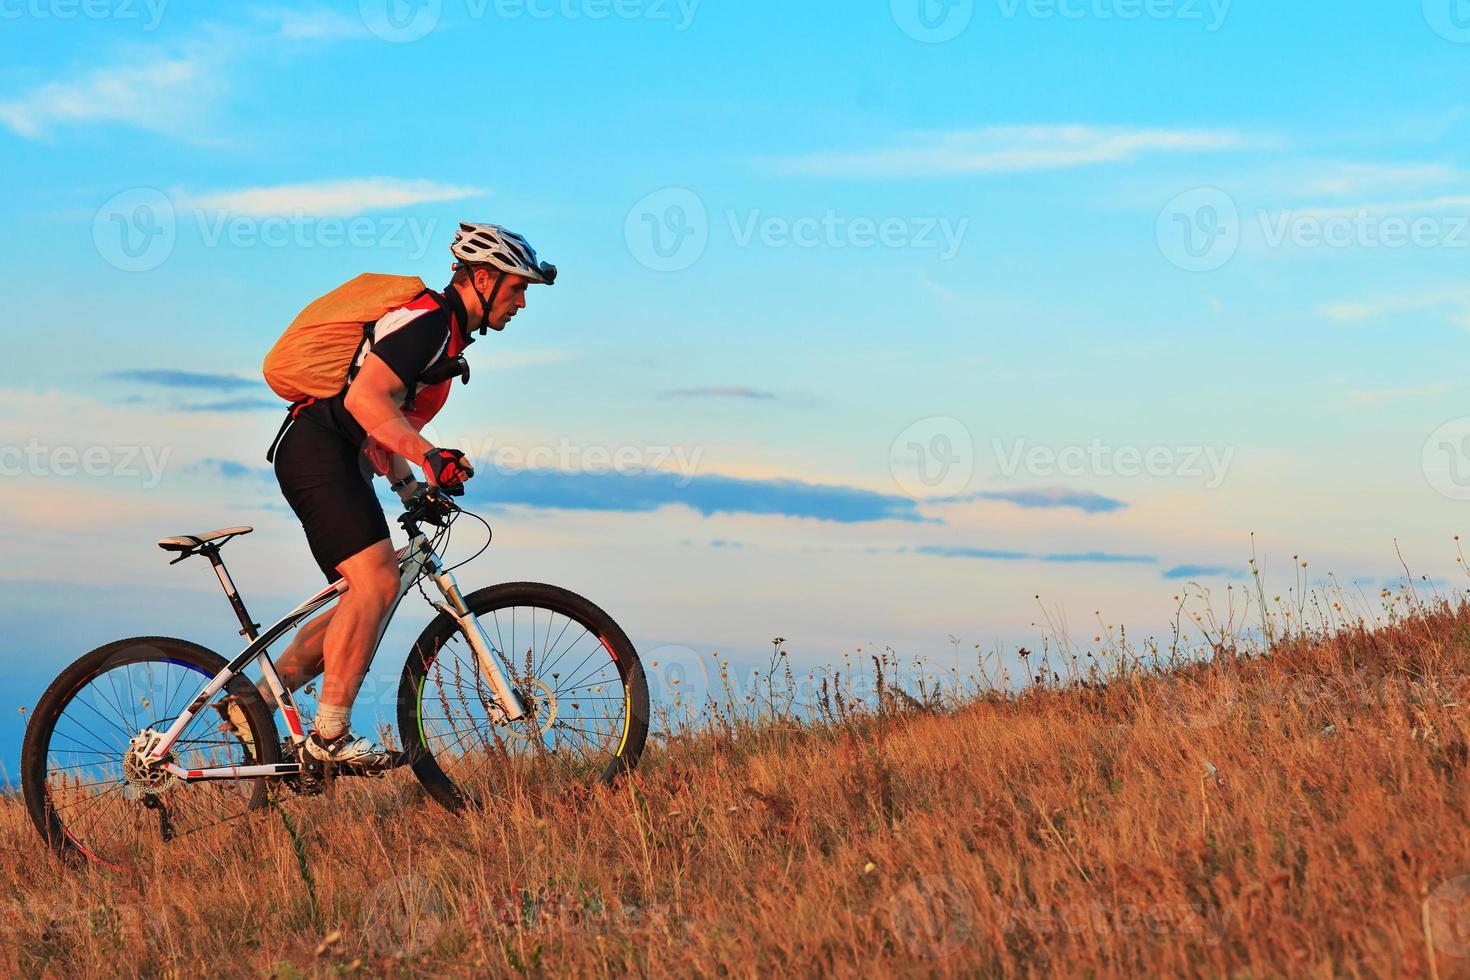 mountainbike cyklist cykla utomhus foto